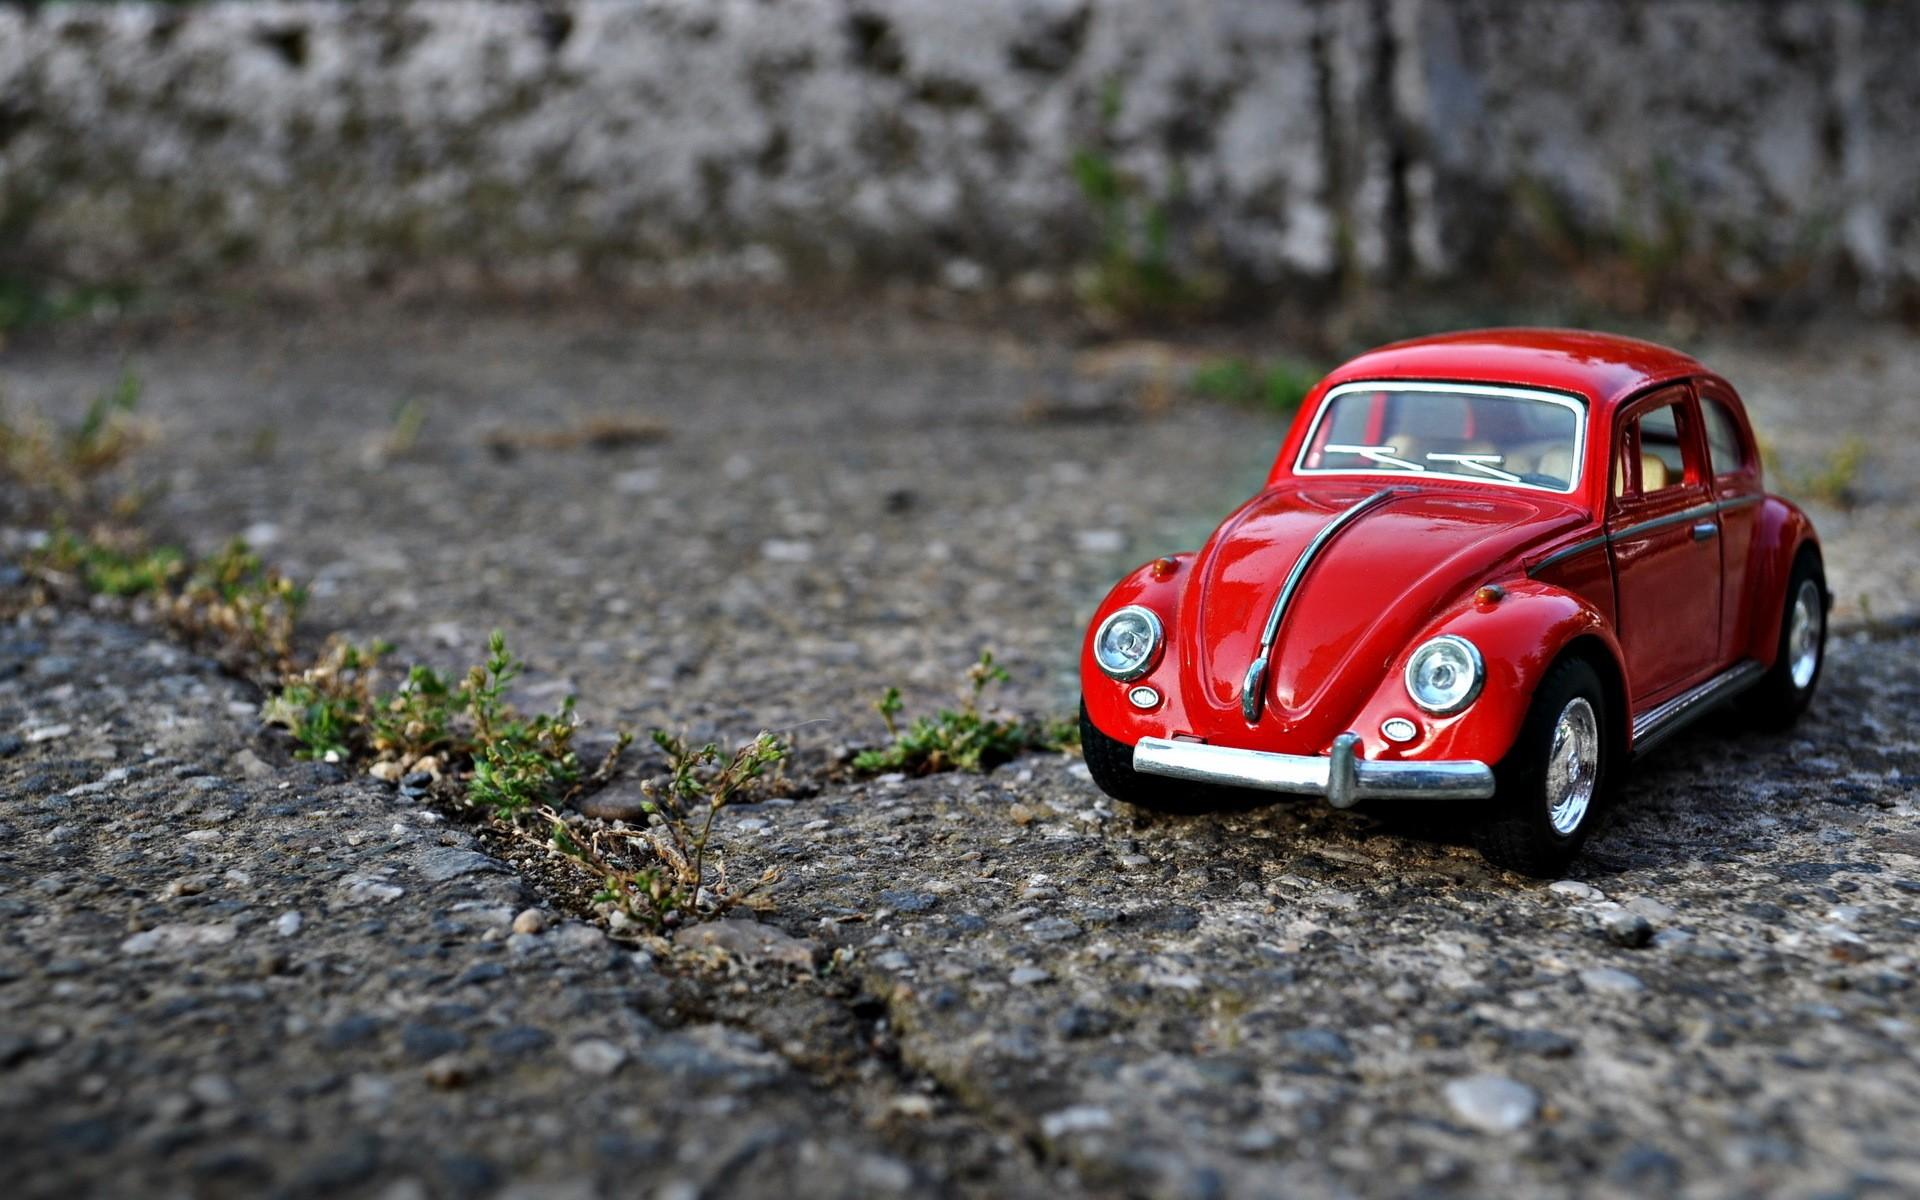 Toy Car HD Wallpaper